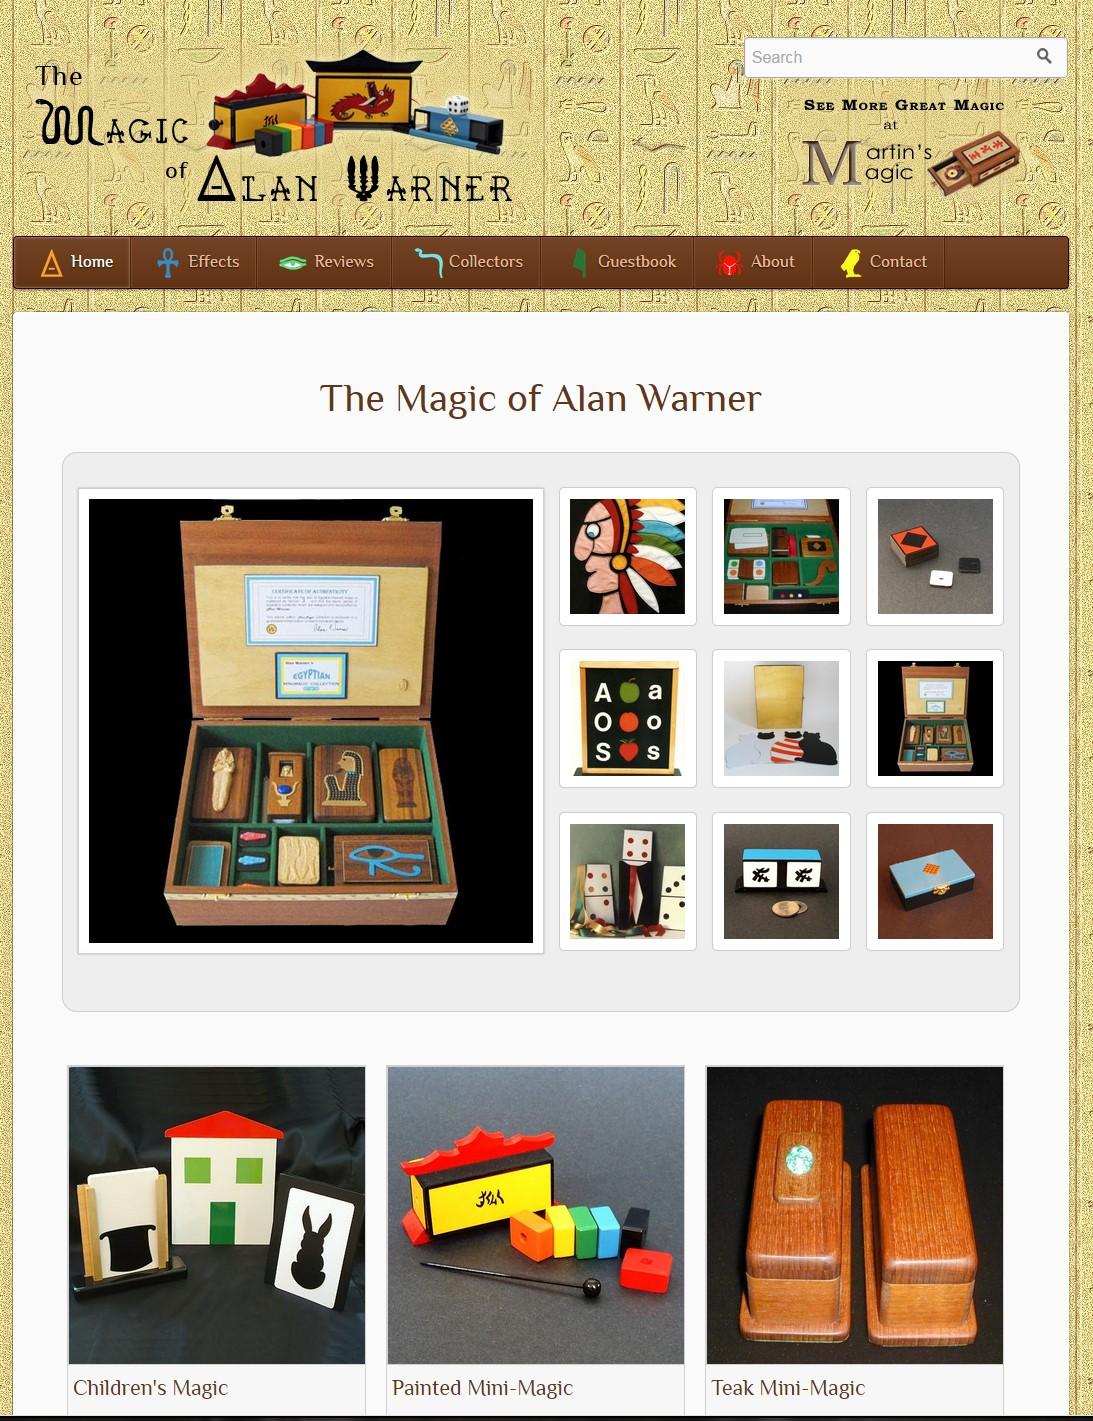 The Magic of Alan Warner